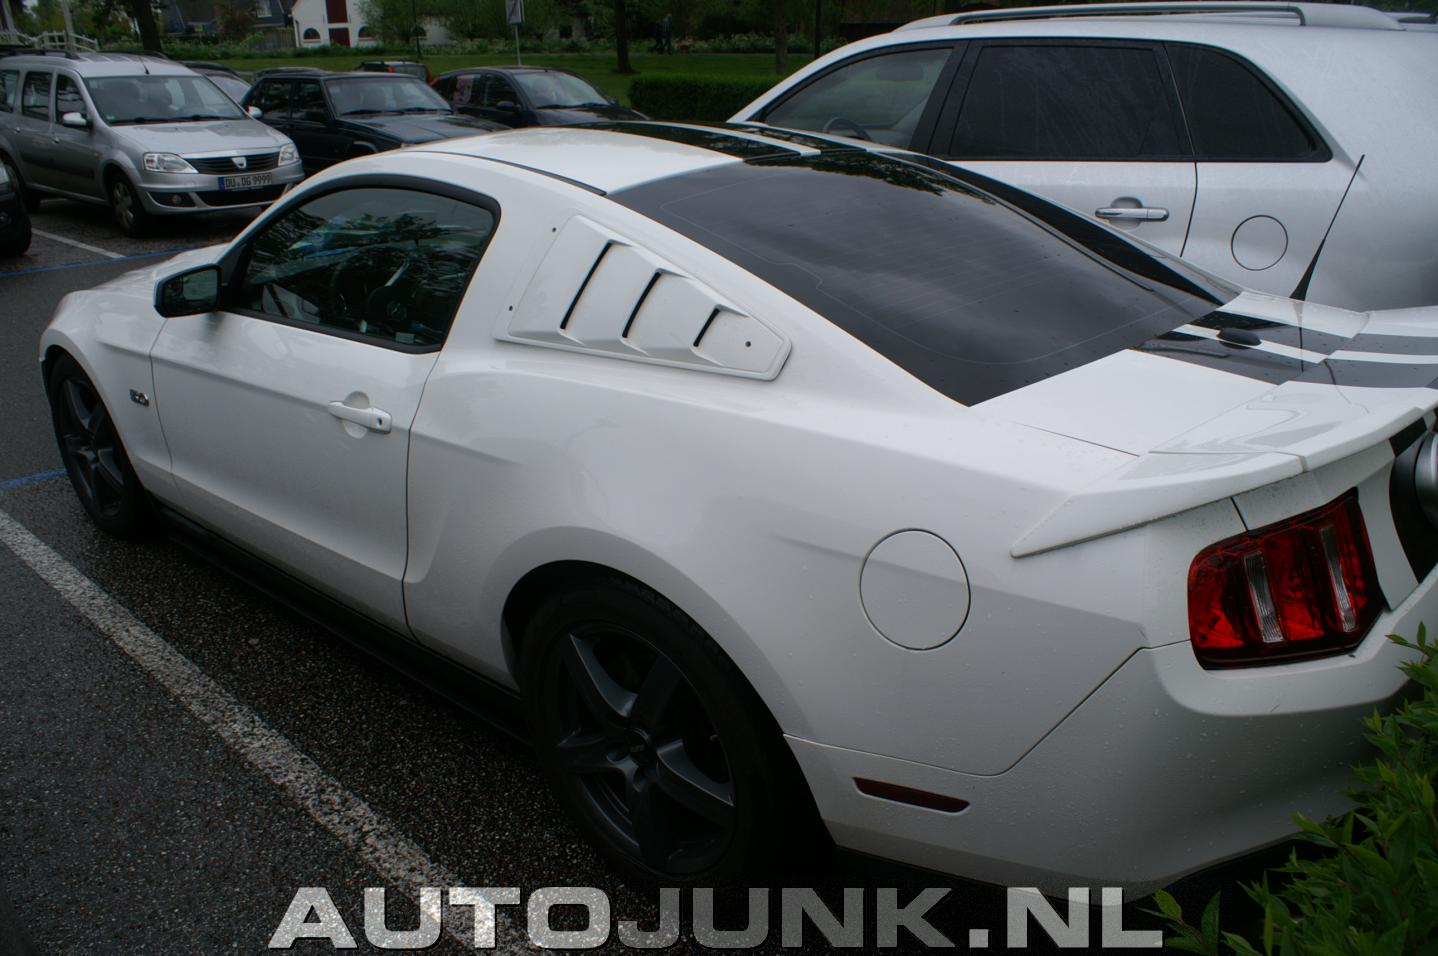 Dikke Mustang foto's » Autojunk.nl (141721)